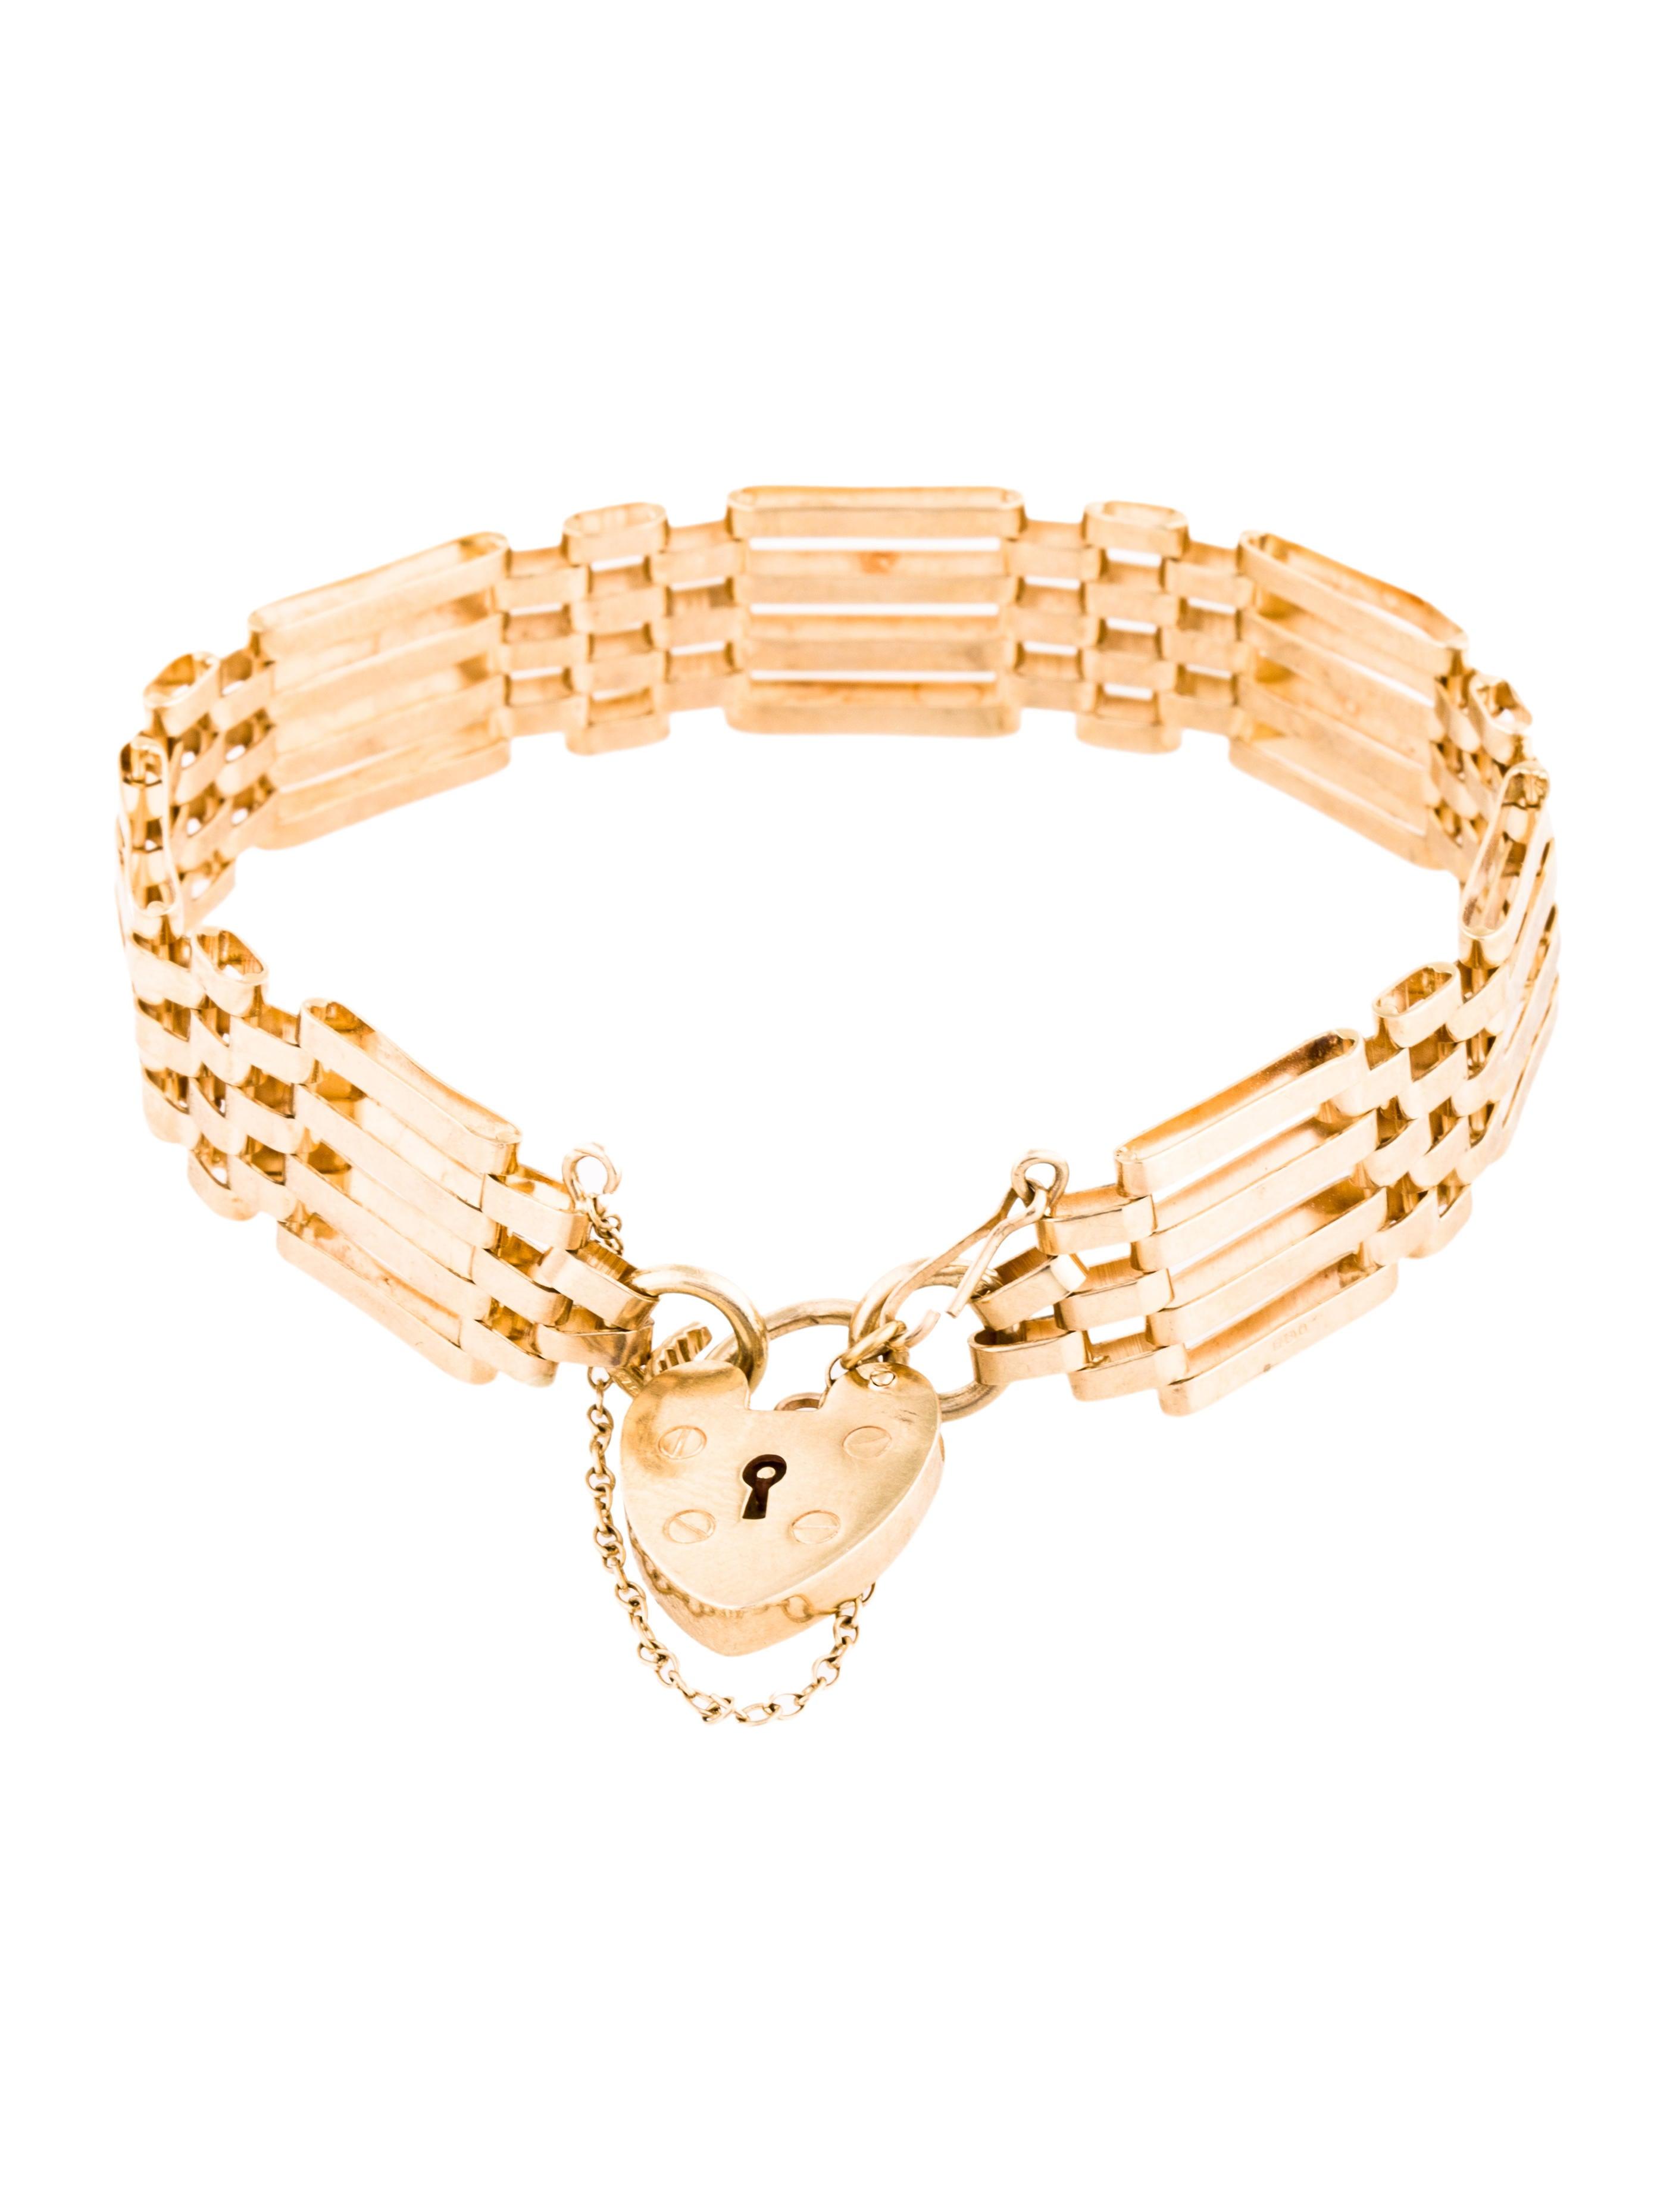 9k Sweetheart Bracelet  Bracelets  Brace25647  The Realreal. Black Bracelet. Green Face Watches. Military Royale Watches. Tri Color Gold Bracelet. Pure Gold Earrings. Embroidery Bracelet. Women Band. Wholesale Sterling Silver